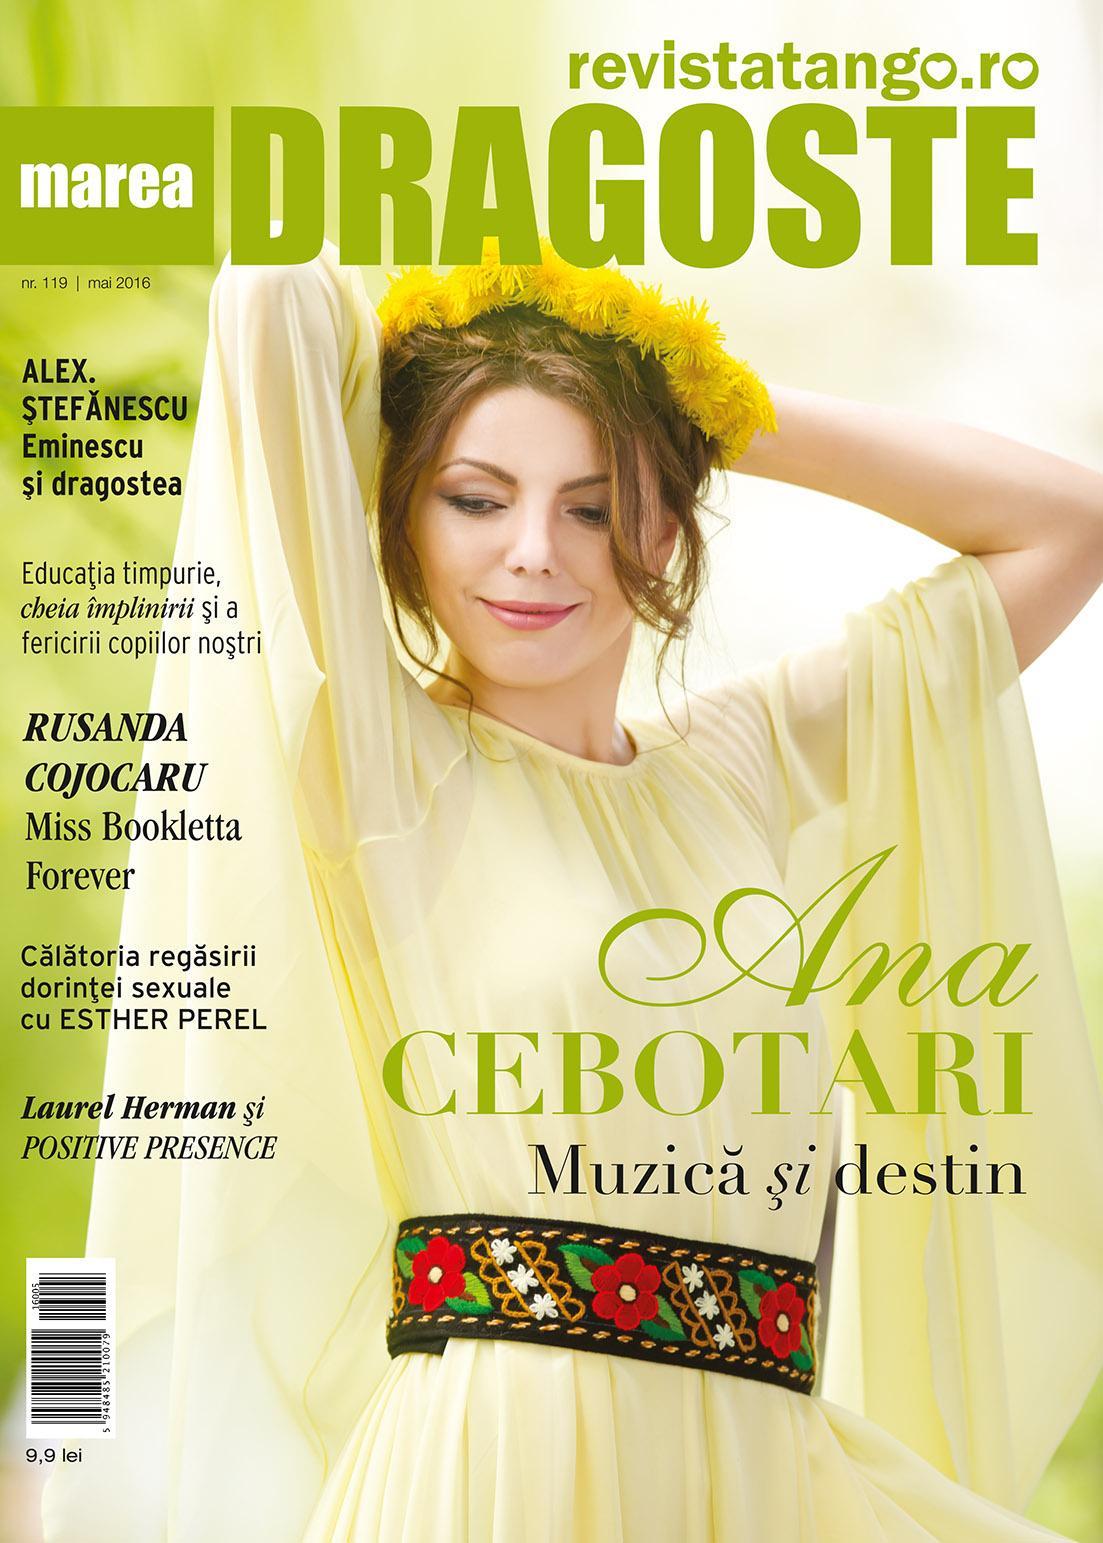 Ana Cebotari pe coperta Marea Dragoste-revistatango.ro, nr. 119, mai 2016